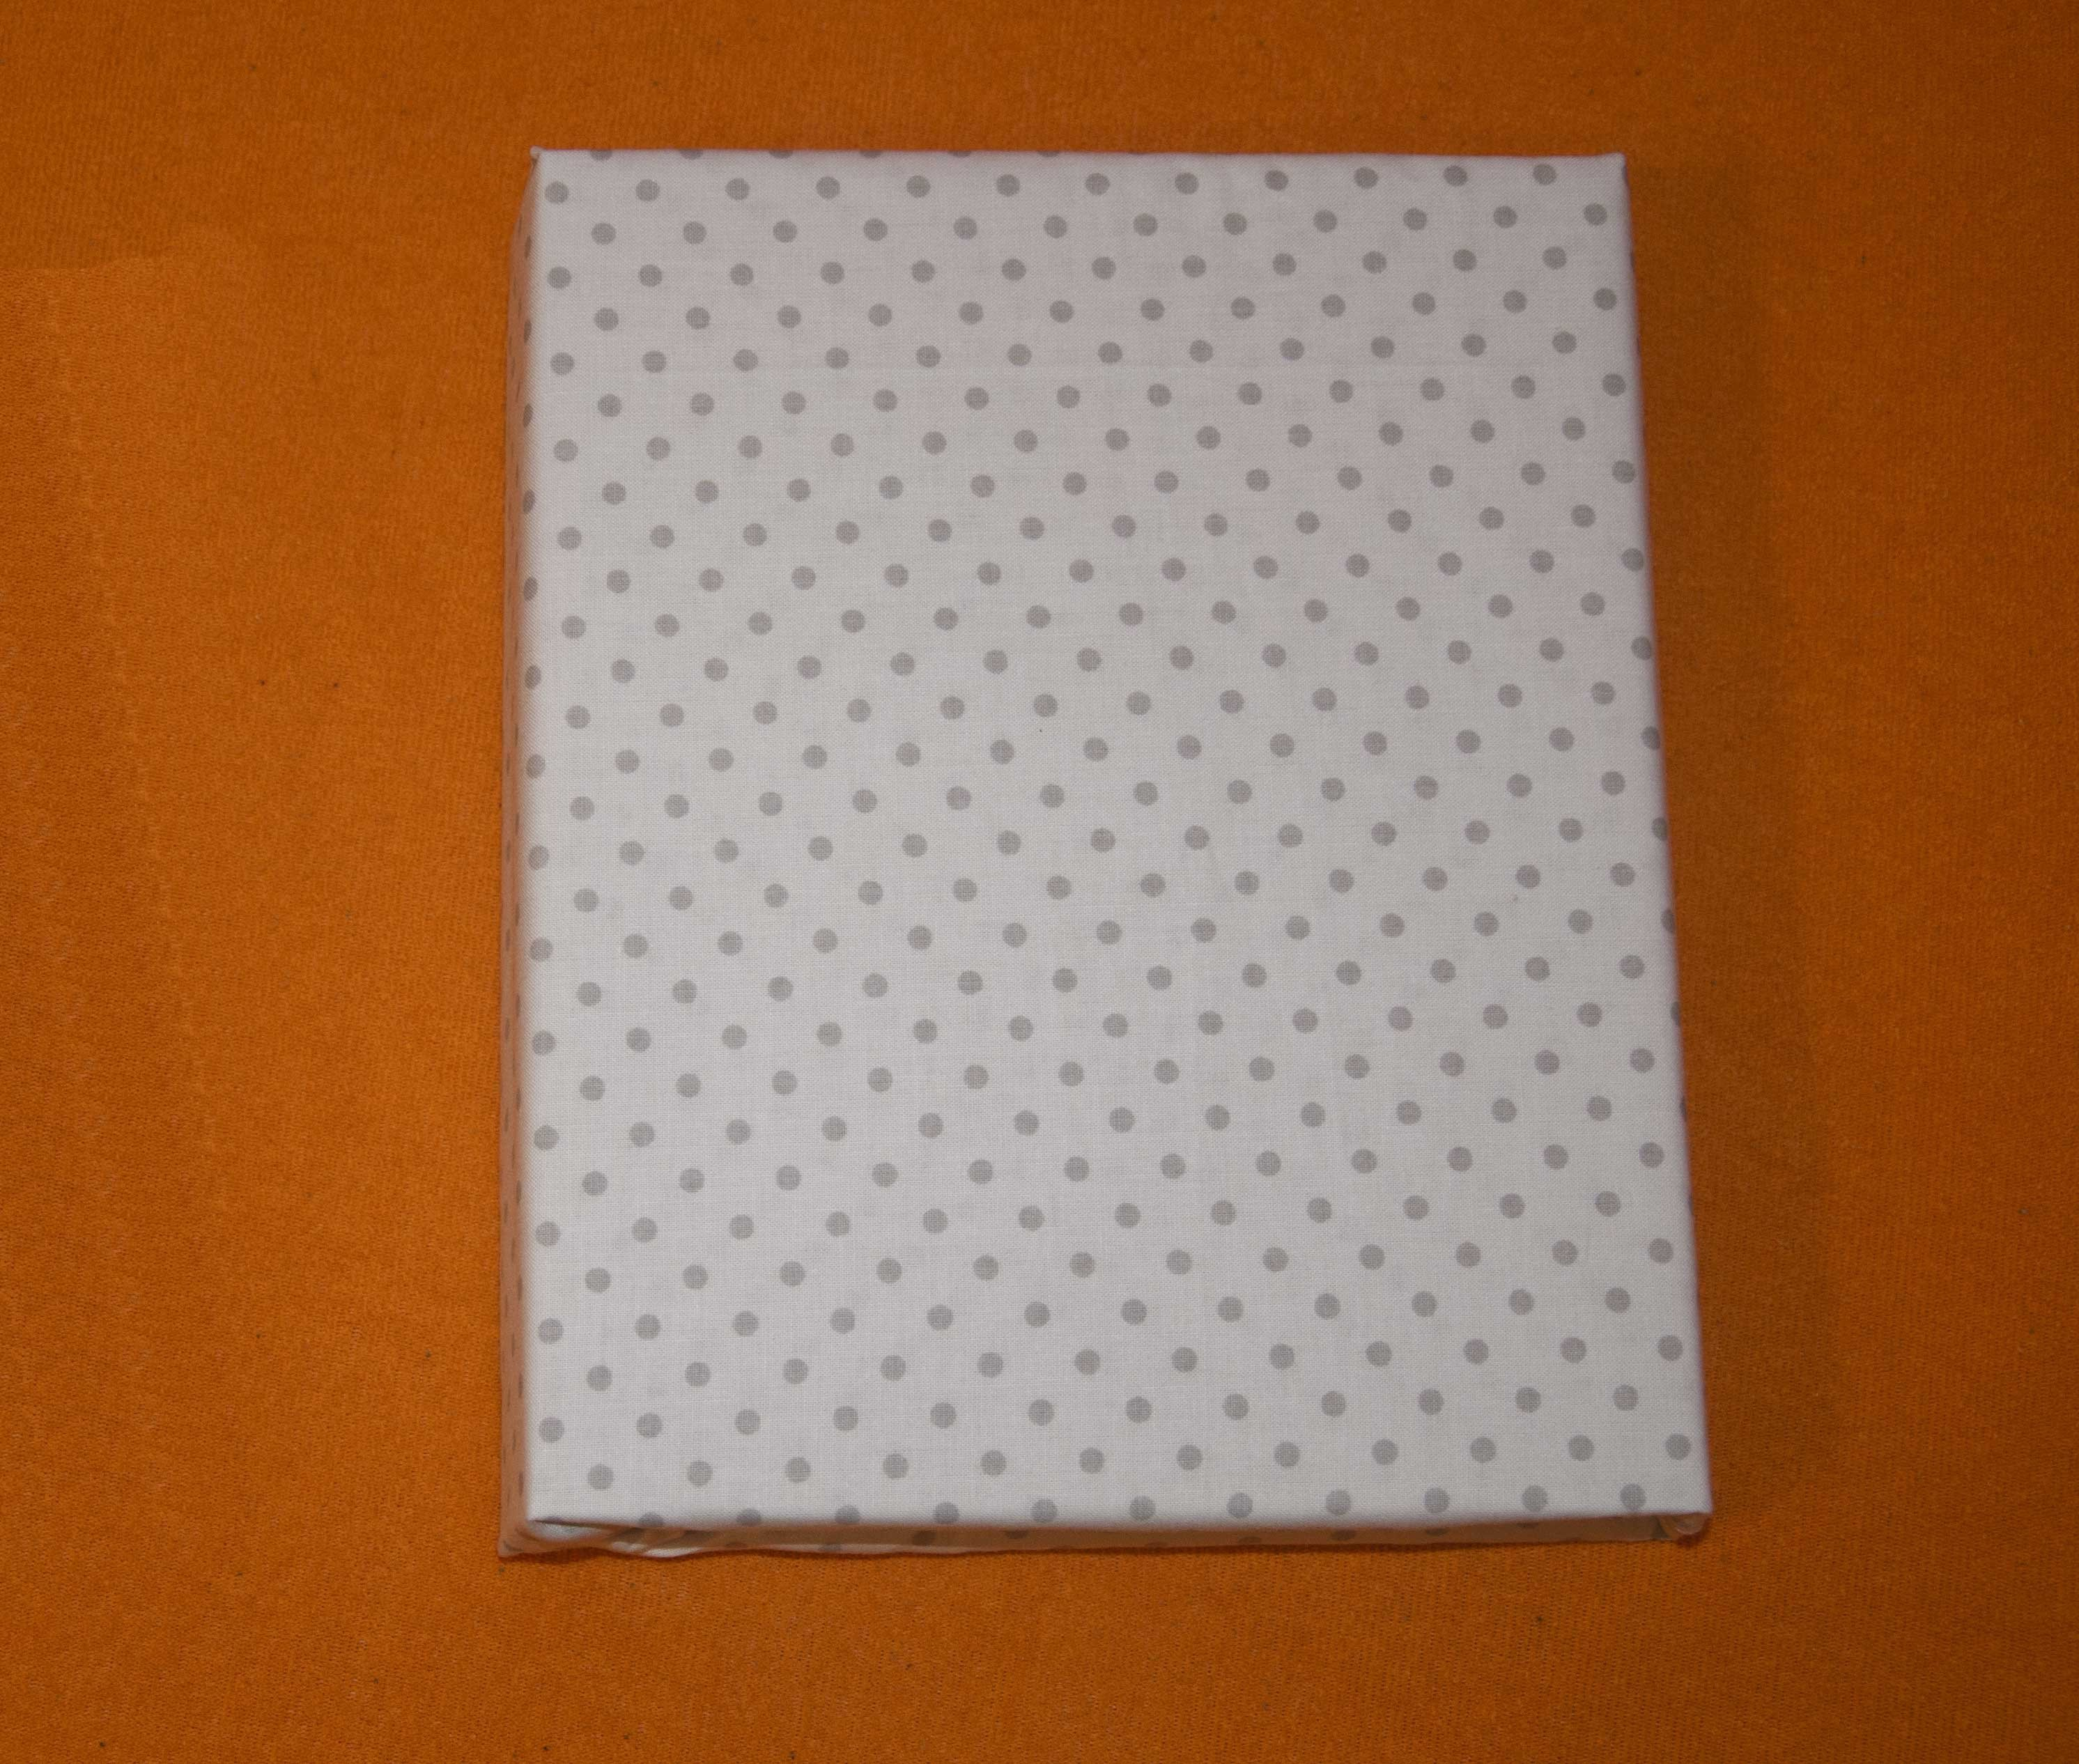 Bavln�n� prost�radlo 120x60 cm b�l� s �ed�mi v�t��mi punt�ky